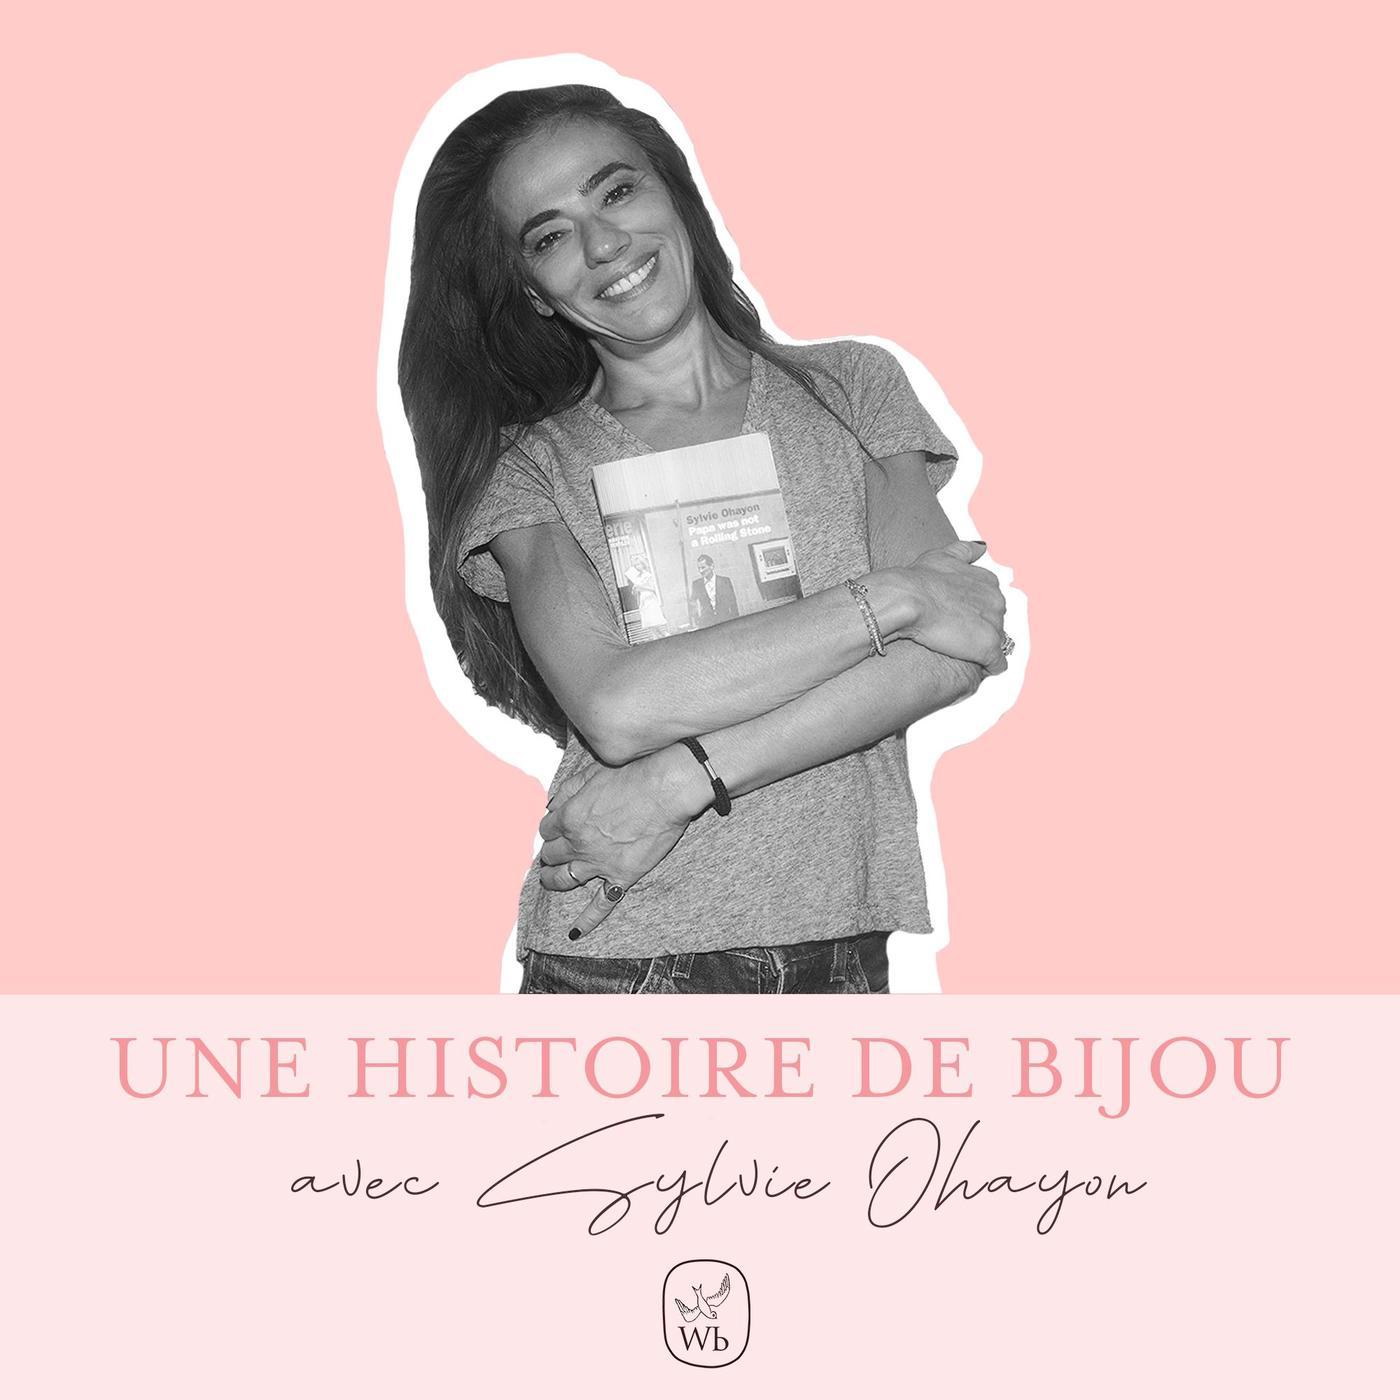 L'histoire de bijou de Sylvie